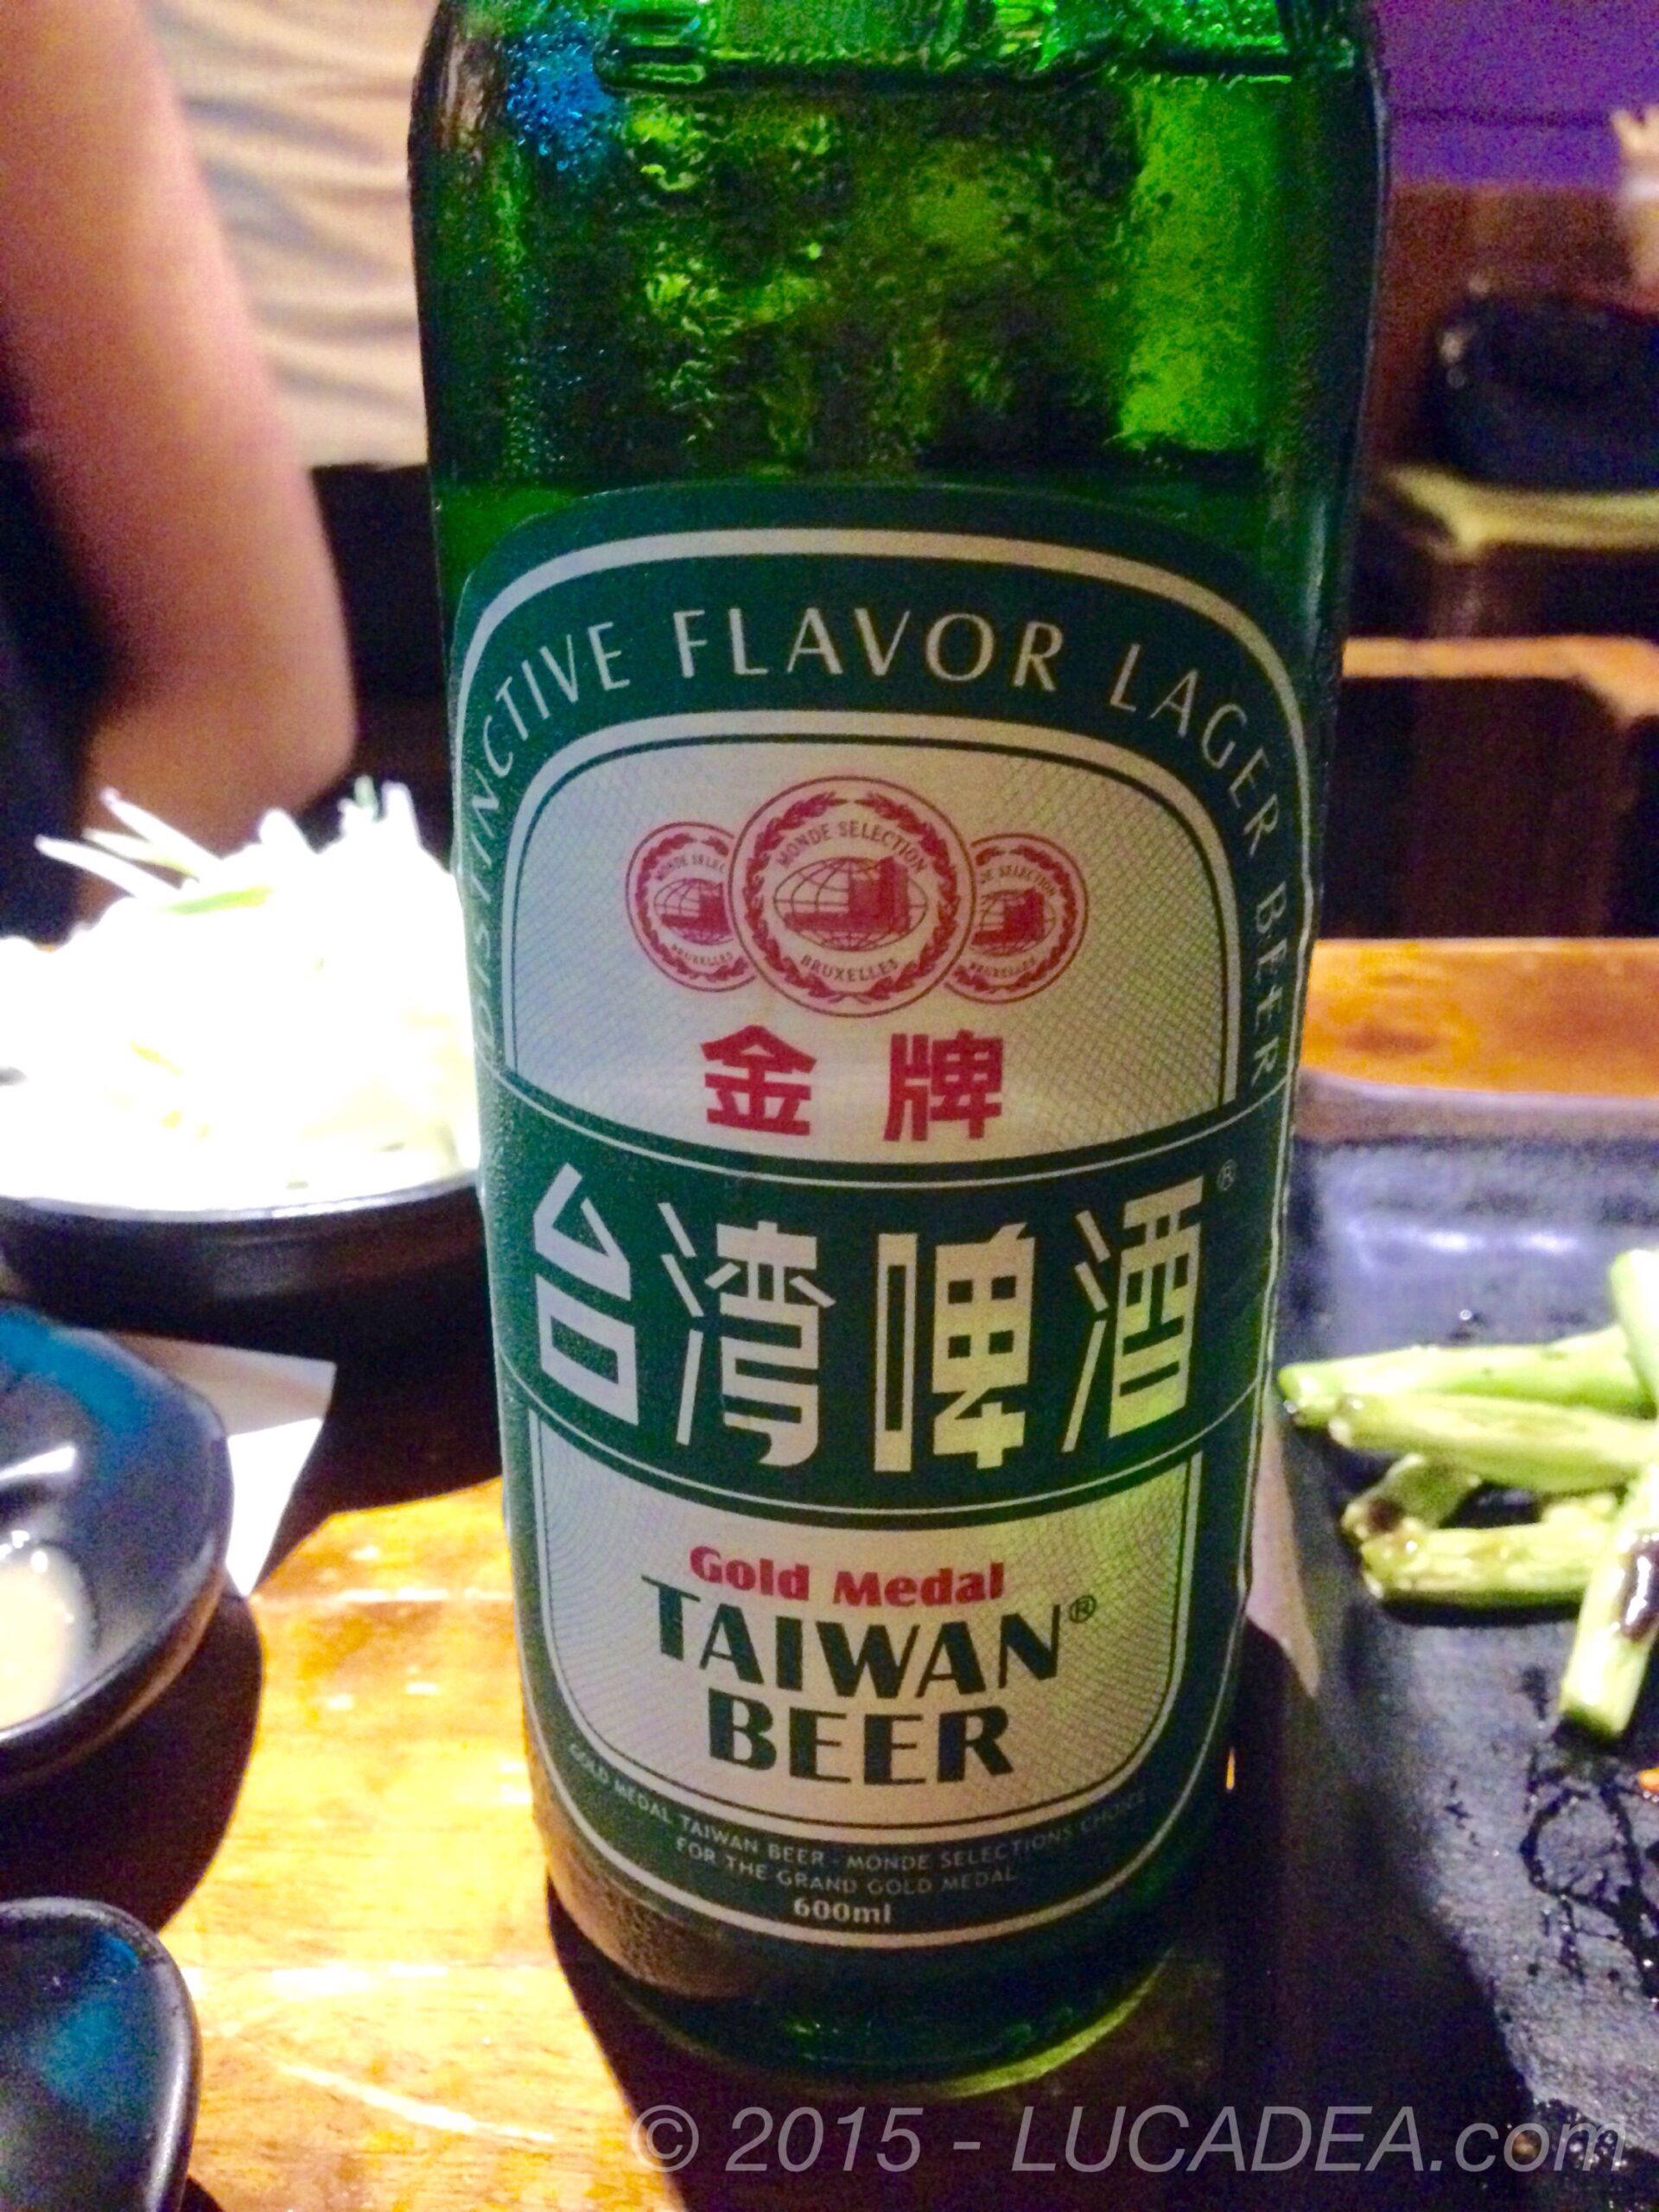 Birra Taiwan: bionda taiwanese